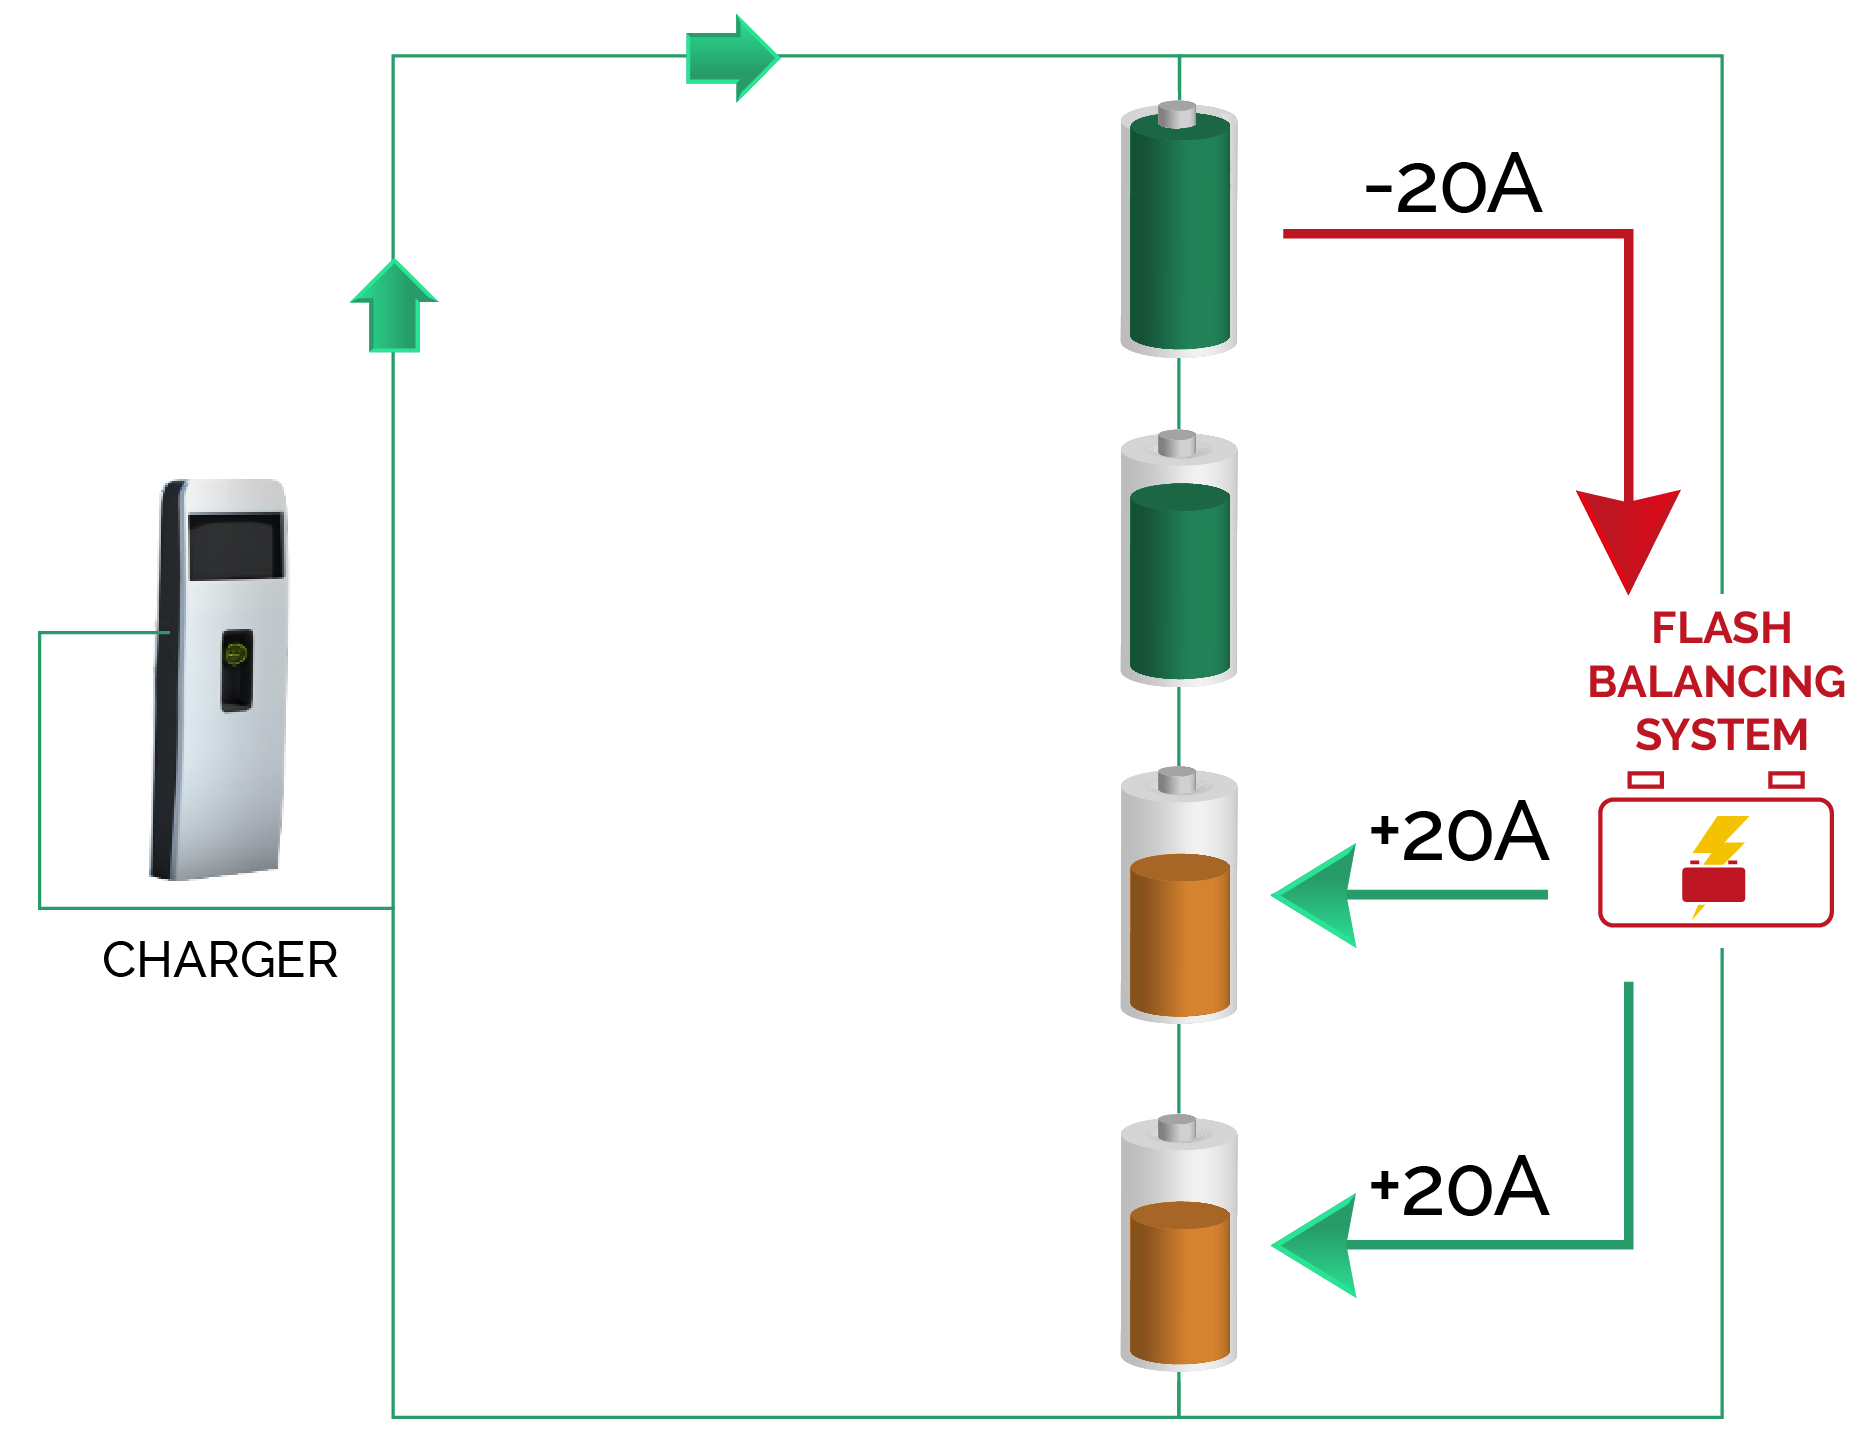 bms balancing flash battery batteries